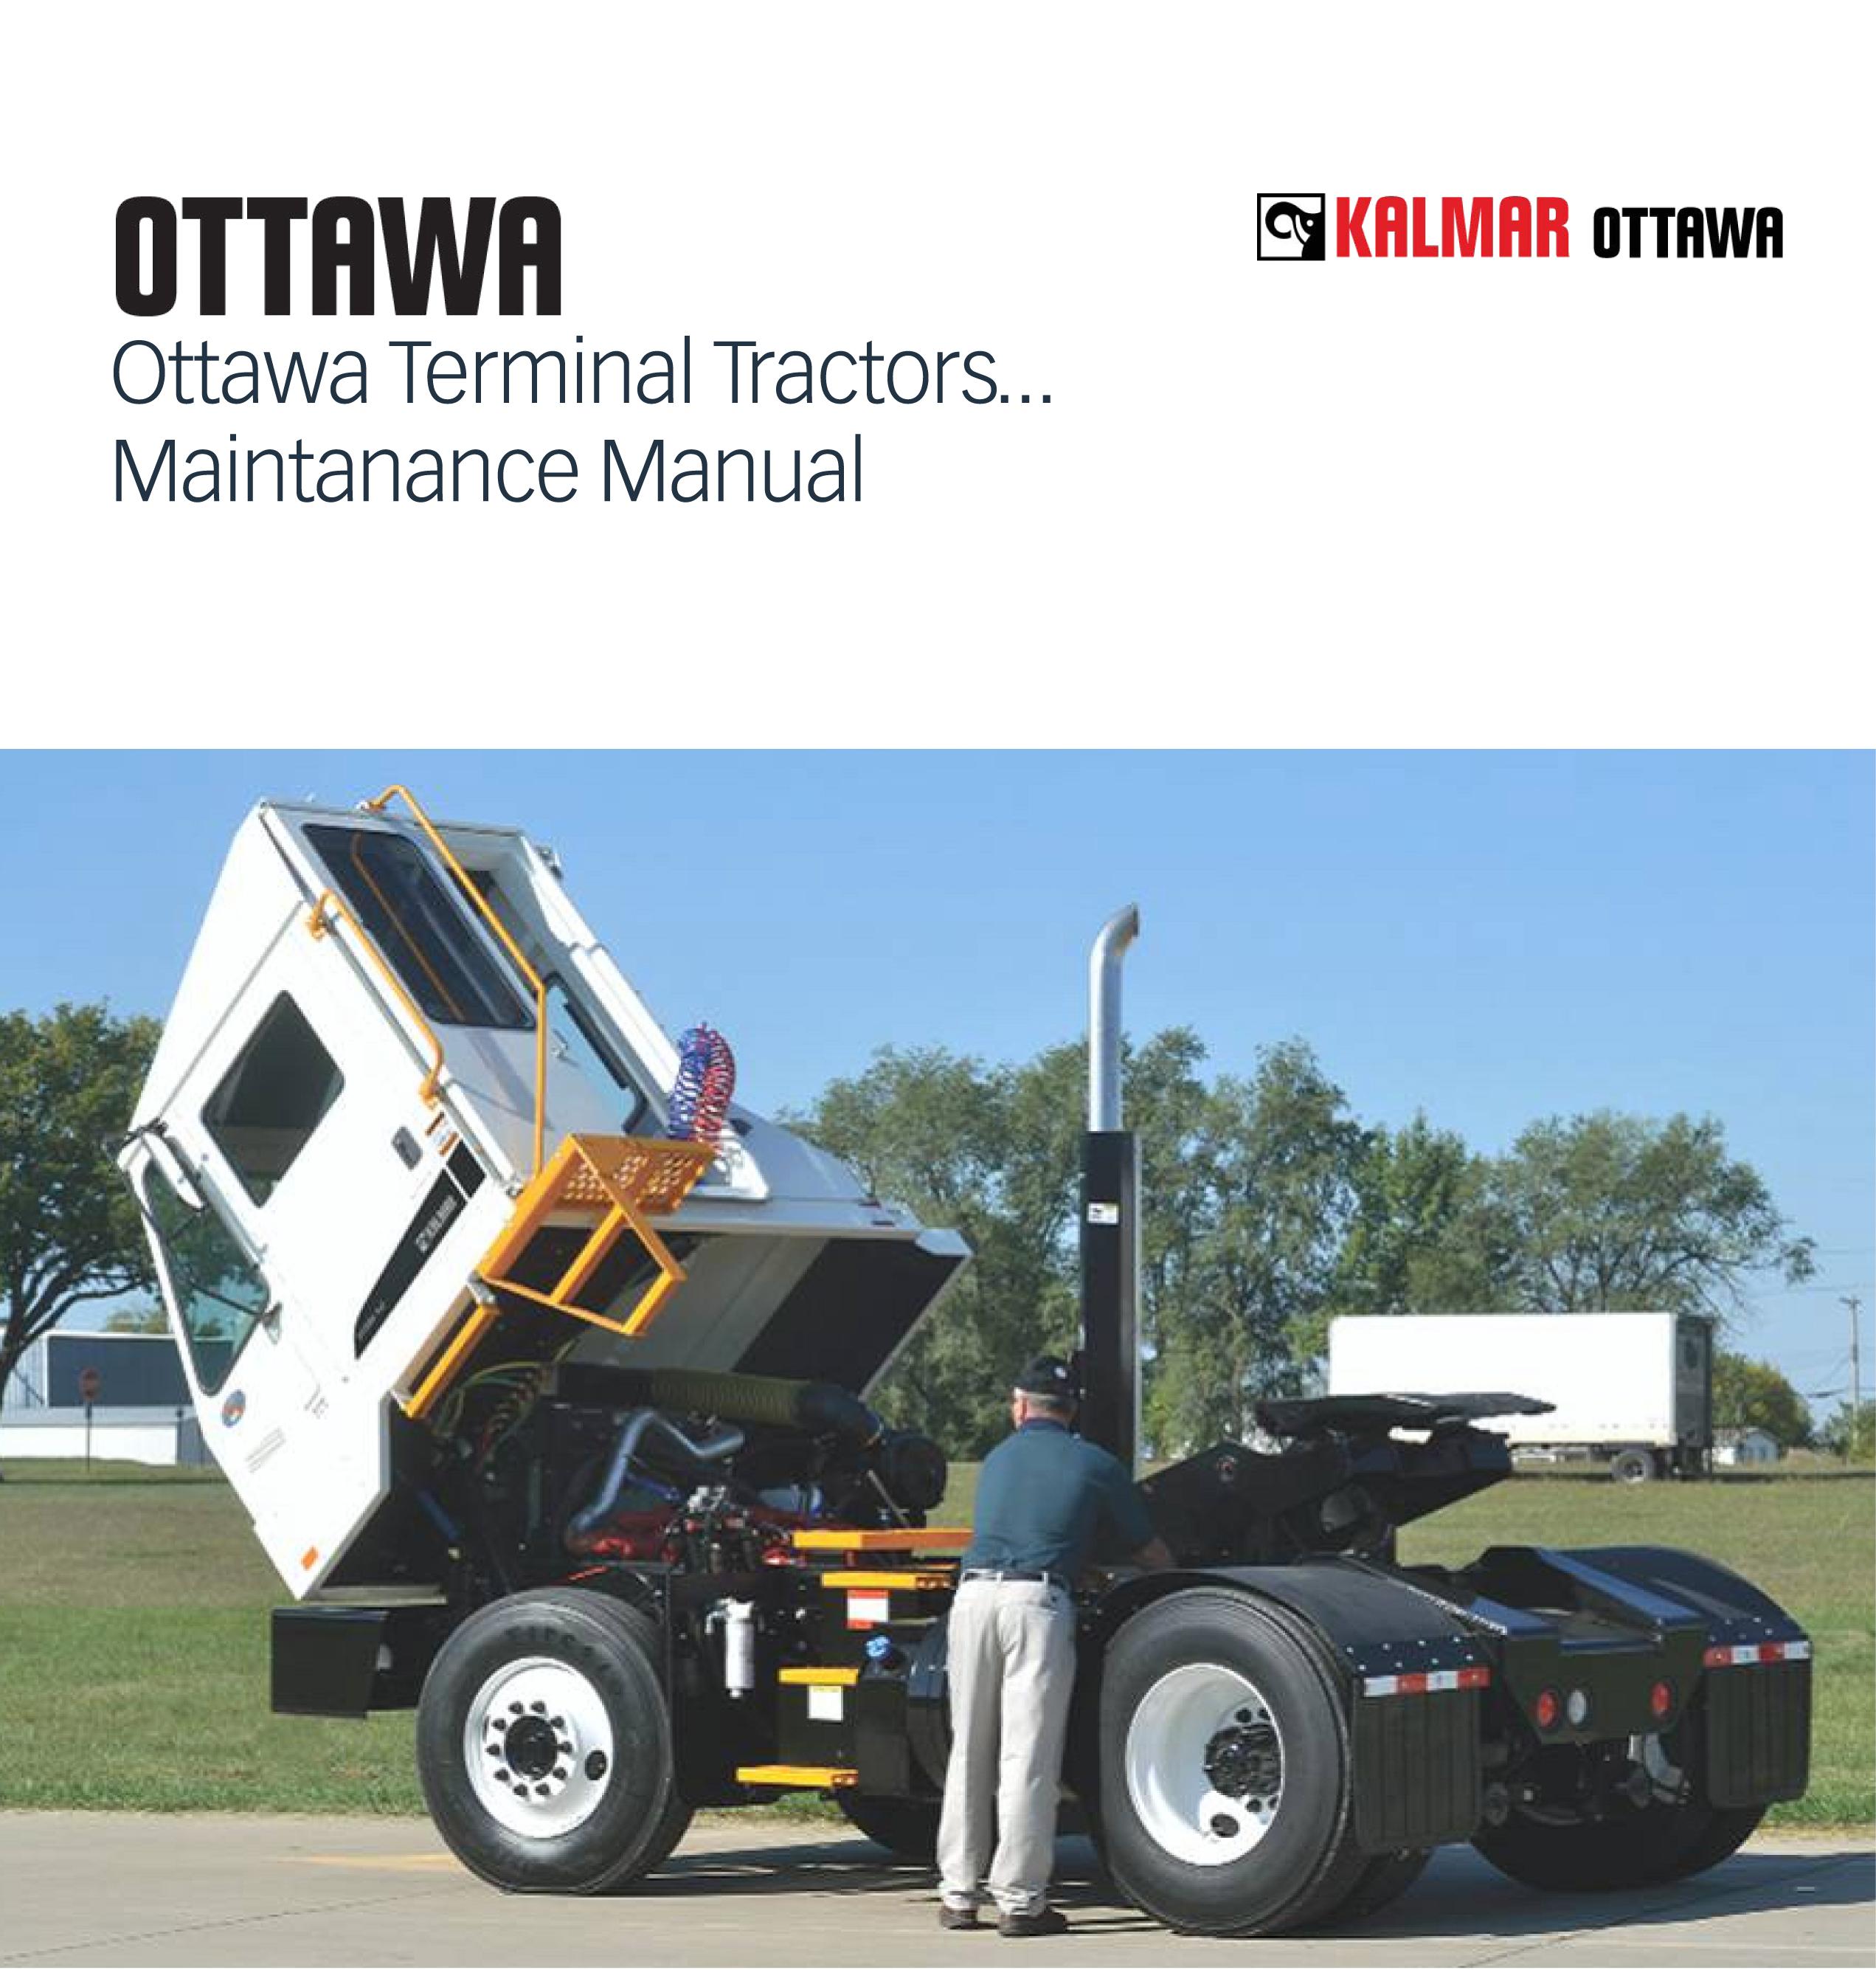 louisville switching ottawa truck sales blog ottawa rh louisvilleswitching com ottawa truck wiring diagrams